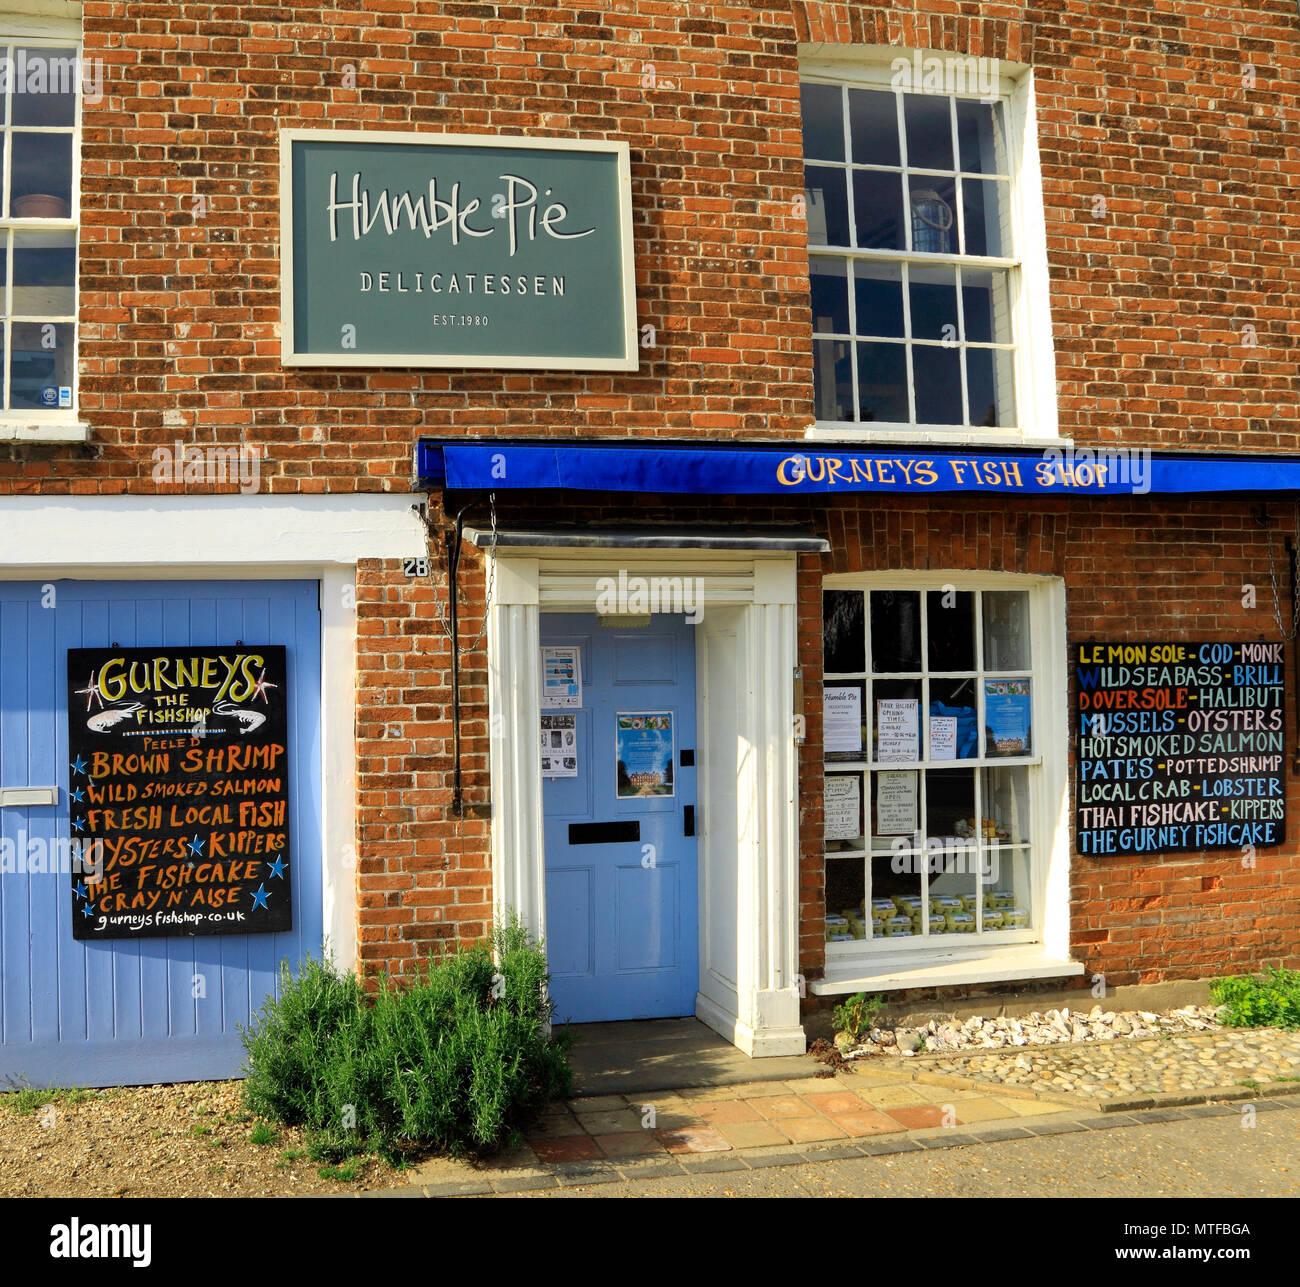 Burnham Market shops, Humble Pie, Gurneys Fish Shop, Norfolk, England, UK - Stock Image